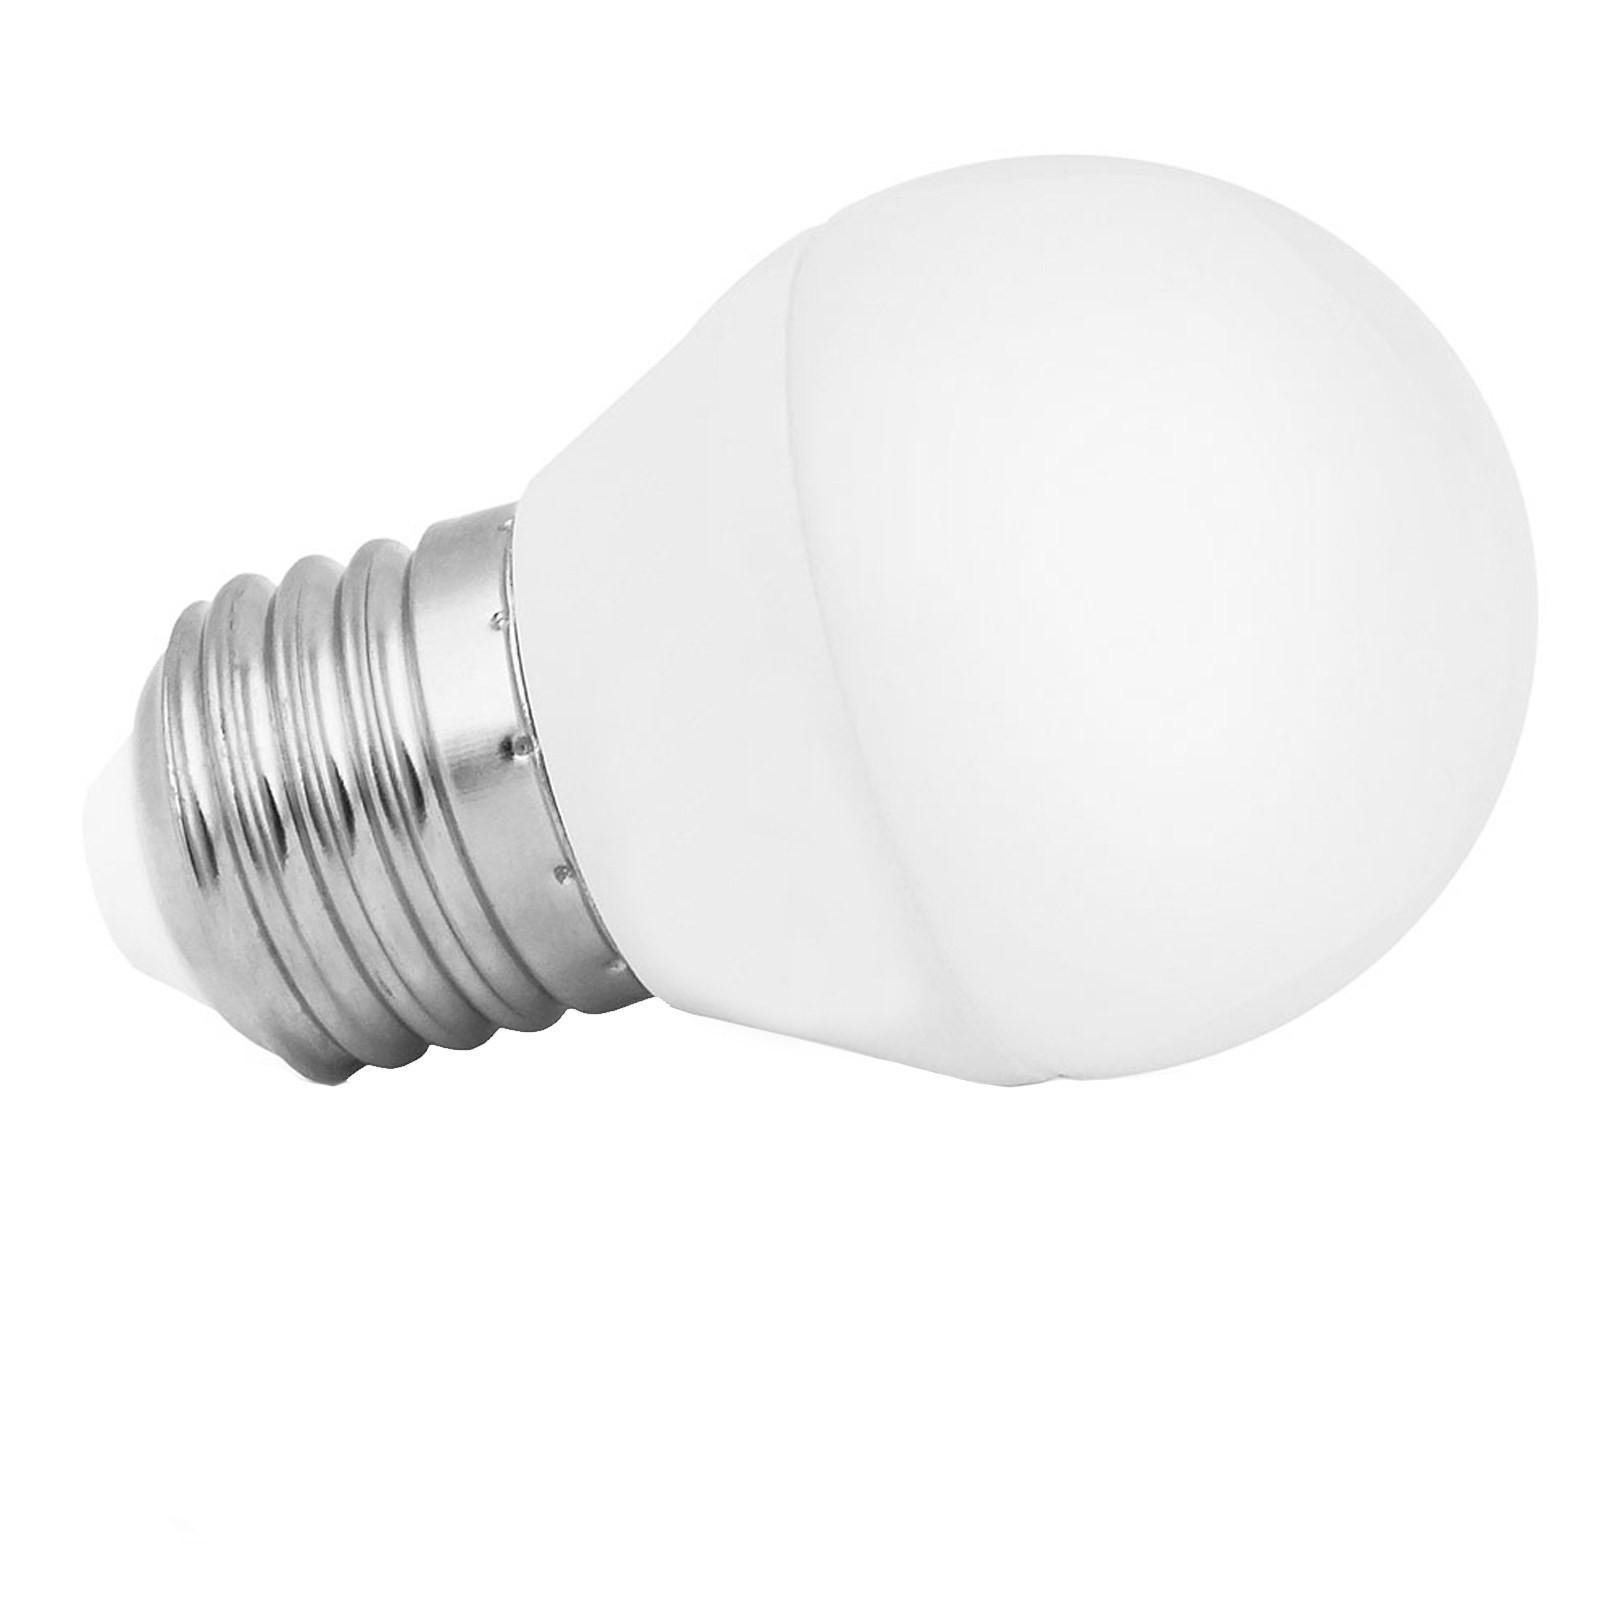 LAMPADA A LED MINISFERA 5,5W FREDDA E27 45x82mm 500 LUMEN 39.920262F